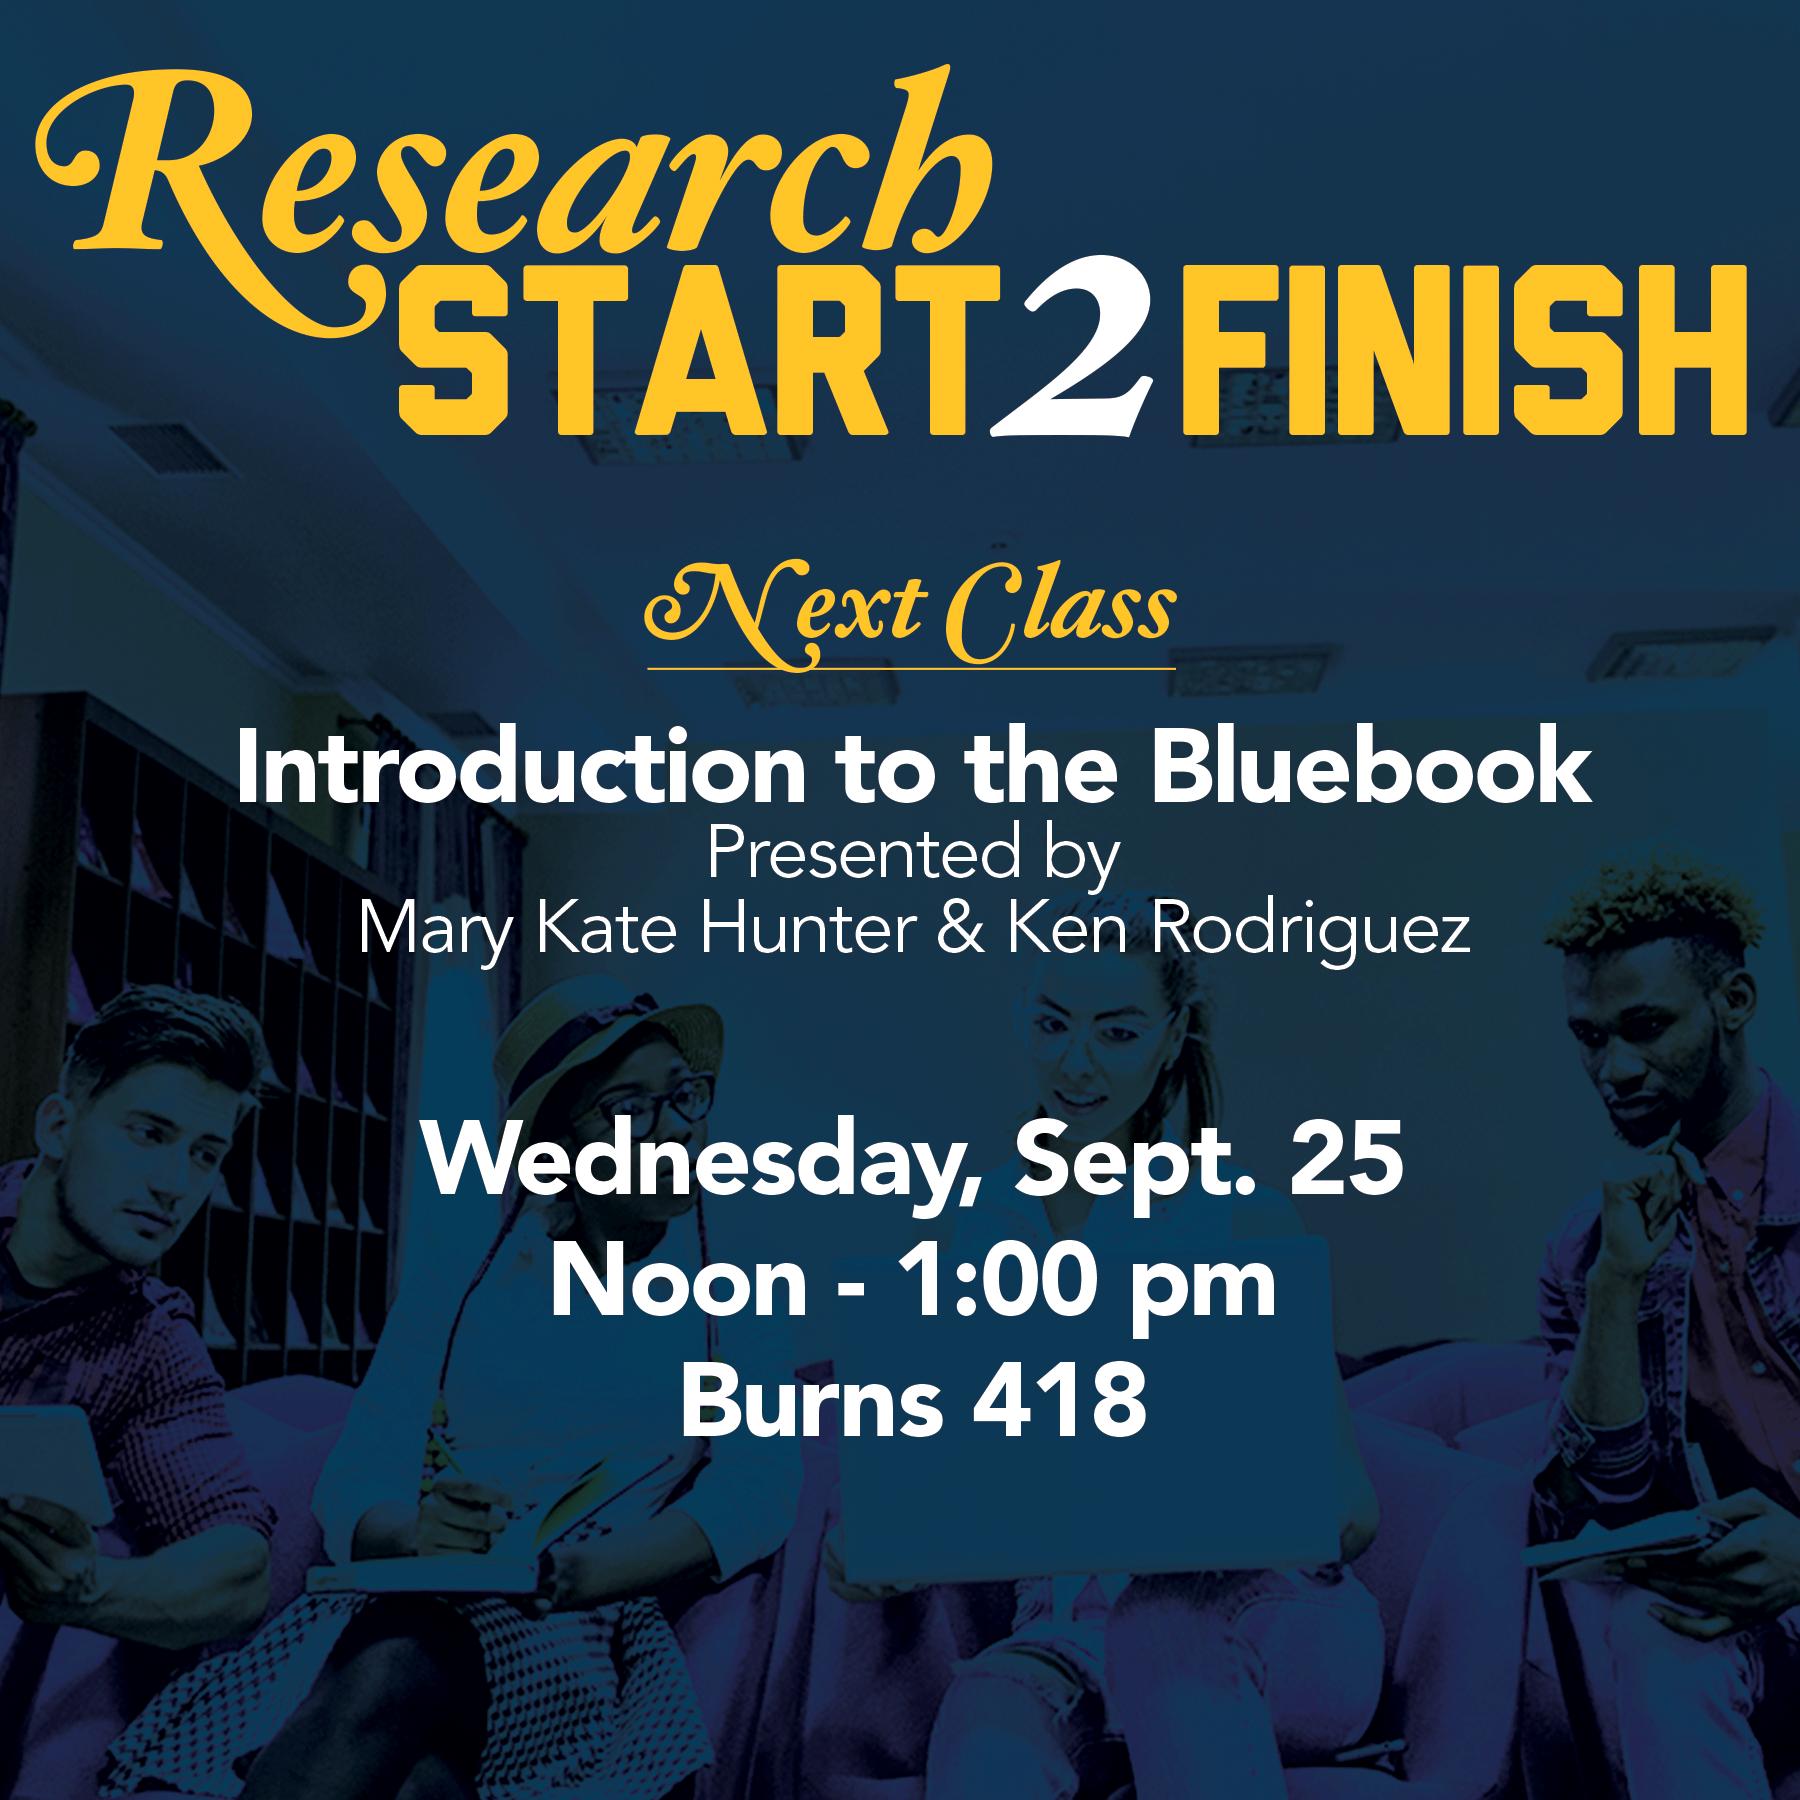 Research Start2Finish